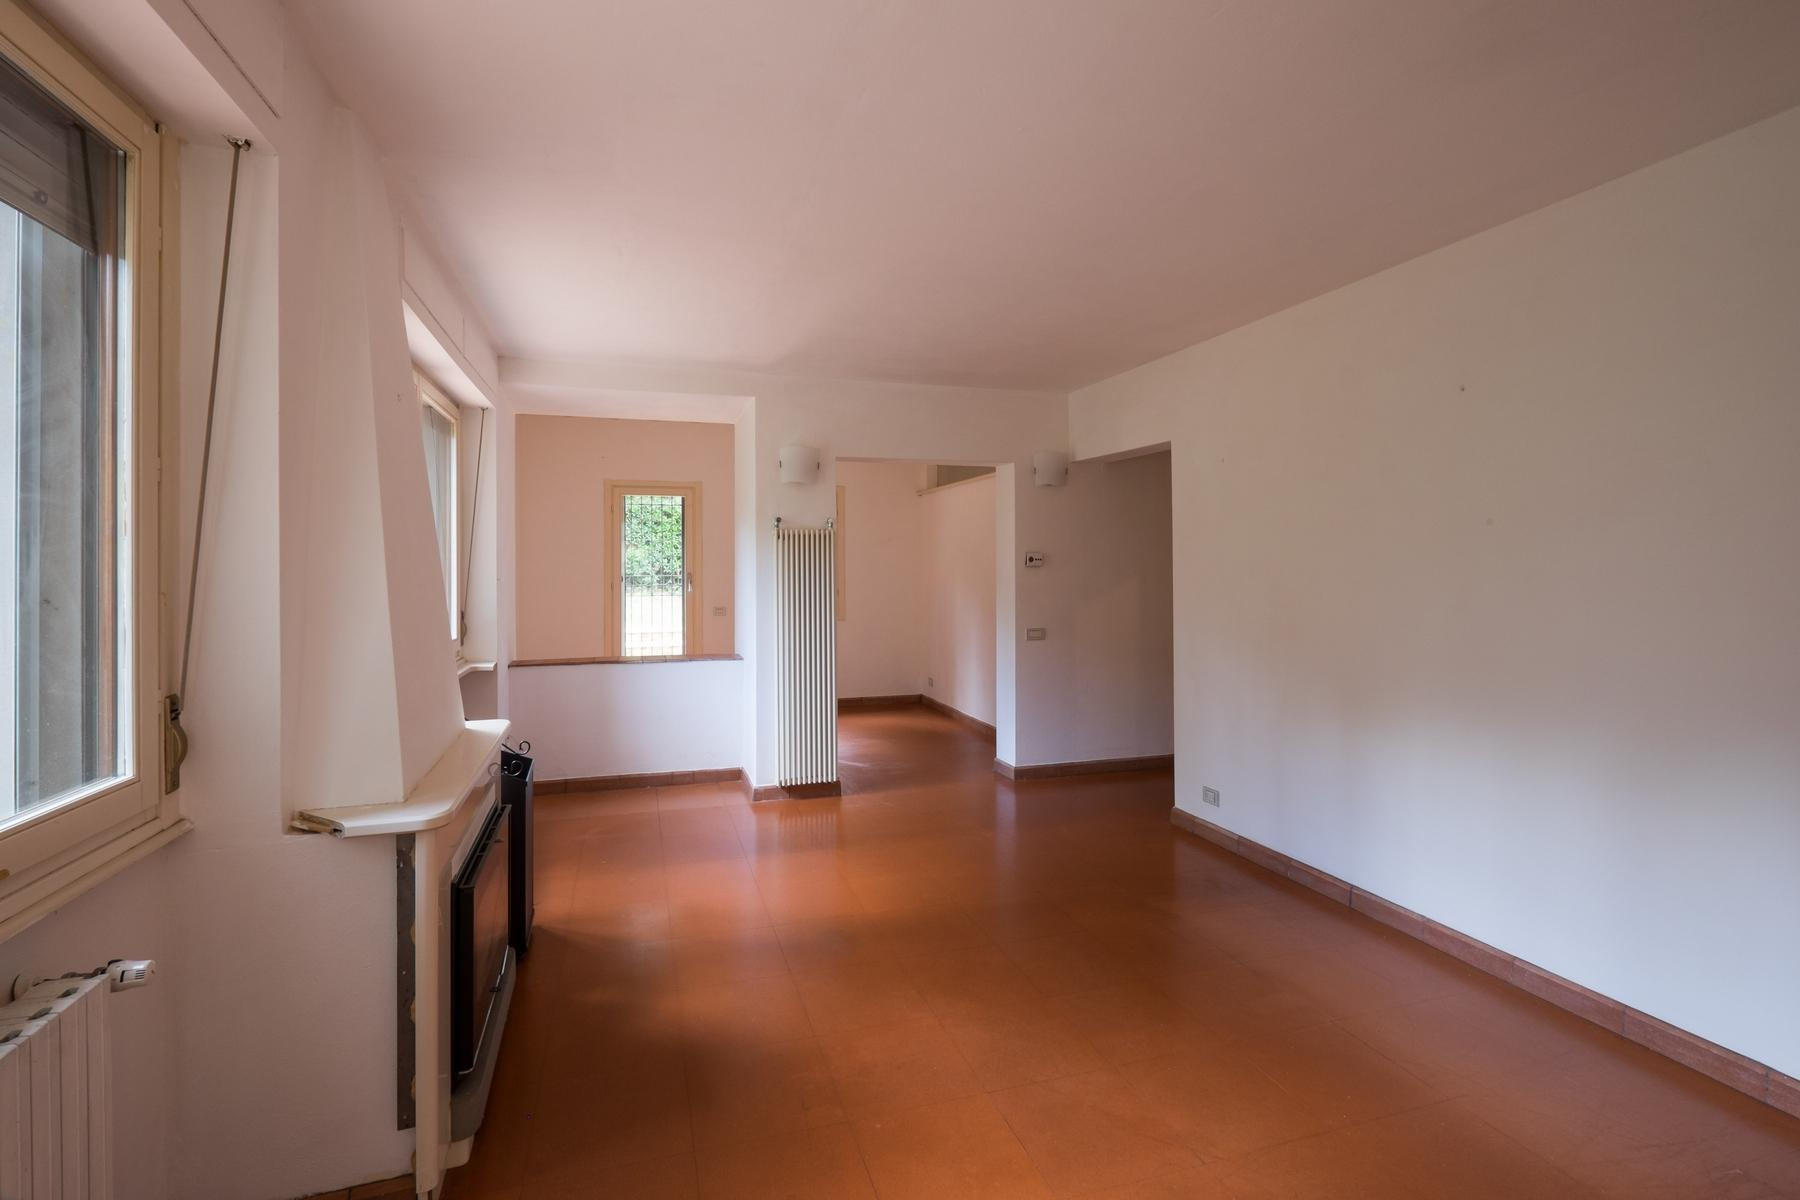 Lovely apartment in exclusive Poggio Imperiale area - 3